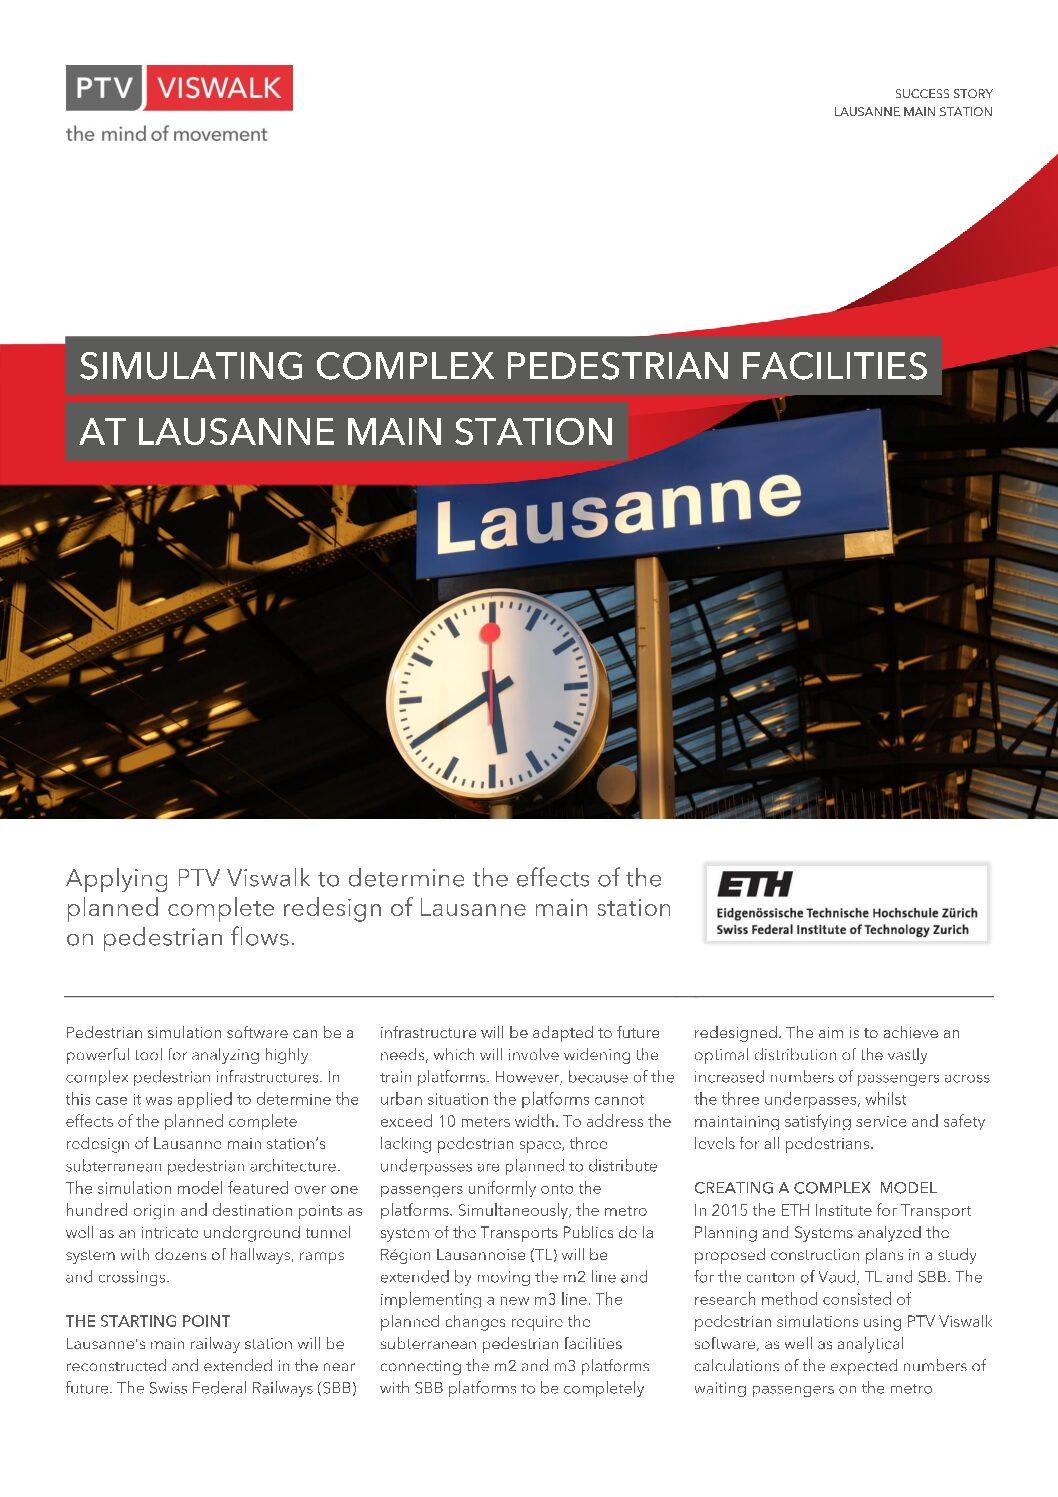 PTV Success Story: Lausanne Main Station